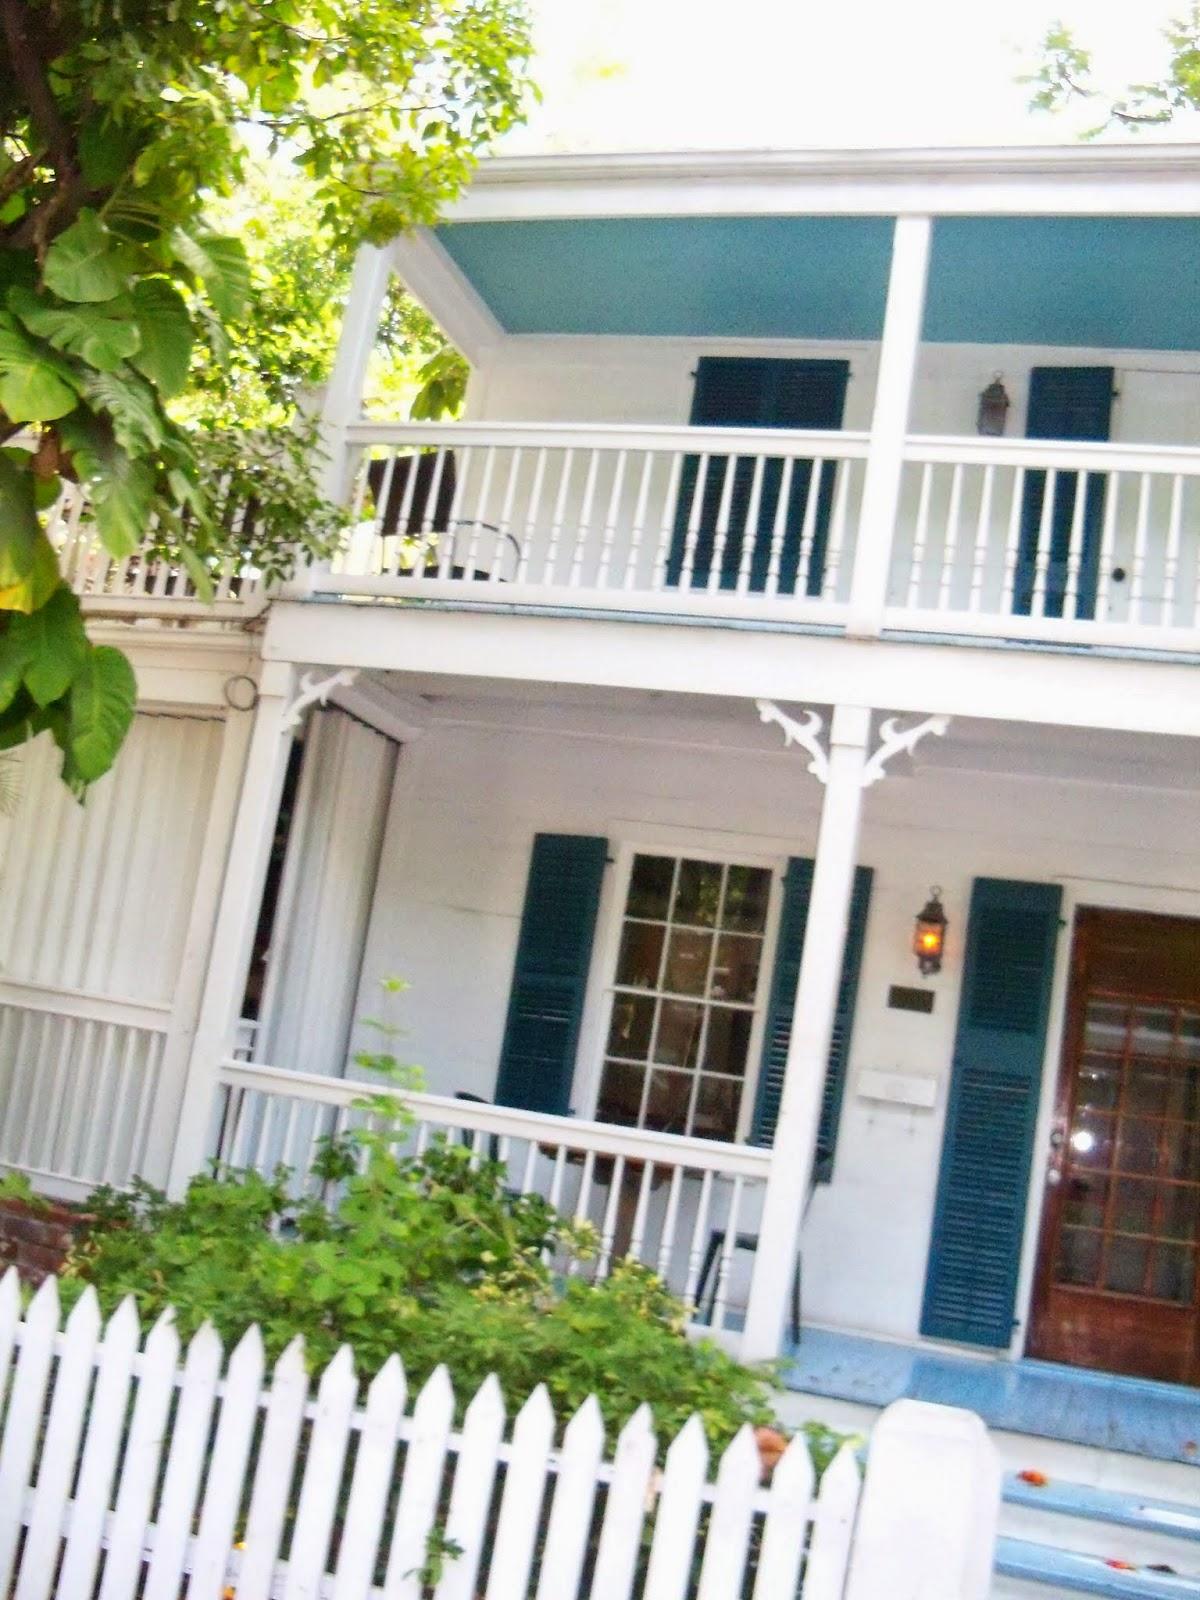 Key West Vacation - 116_5669.JPG